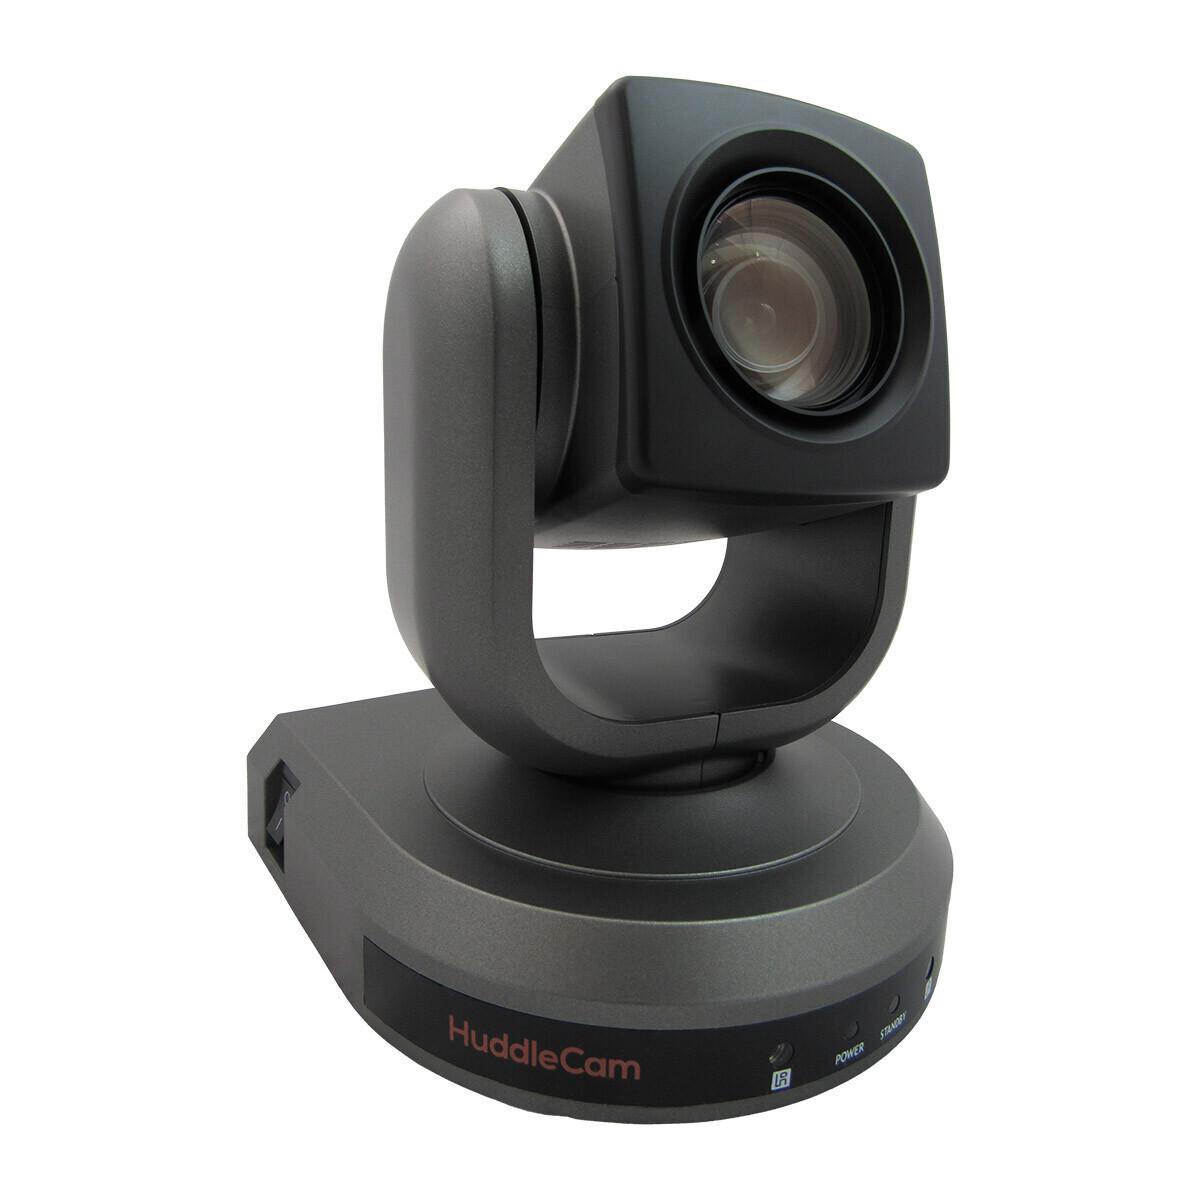 HuddleCamHD HC20X-GY-G2-C telecamera PTZ, colore grigio